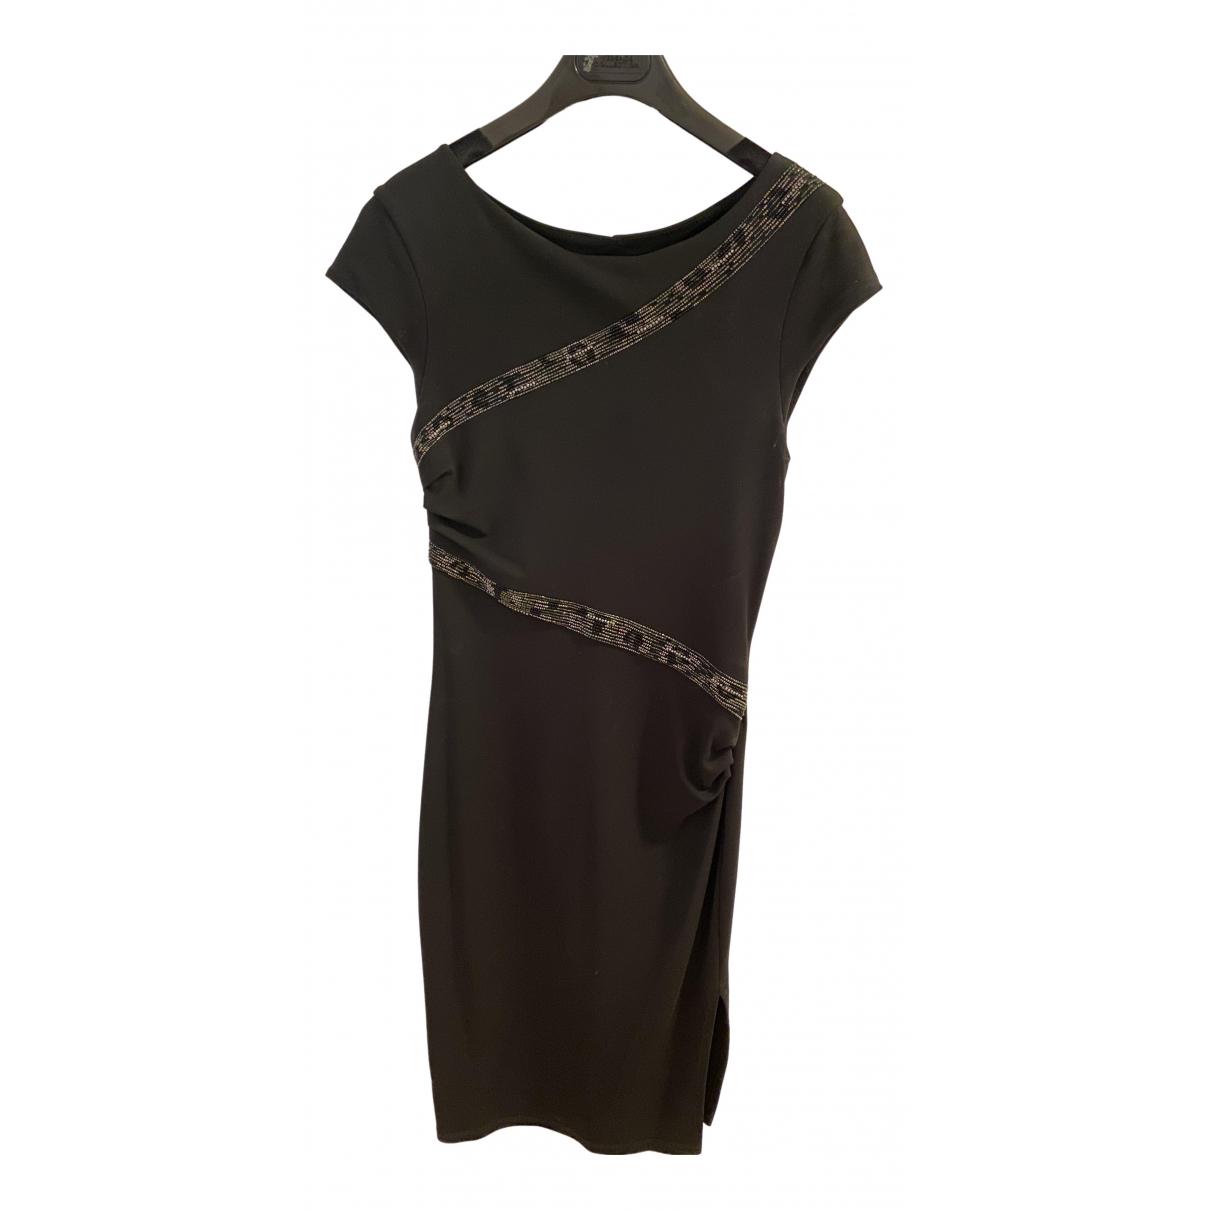 Roberto Cavalli \N Black dress for Women 40 IT